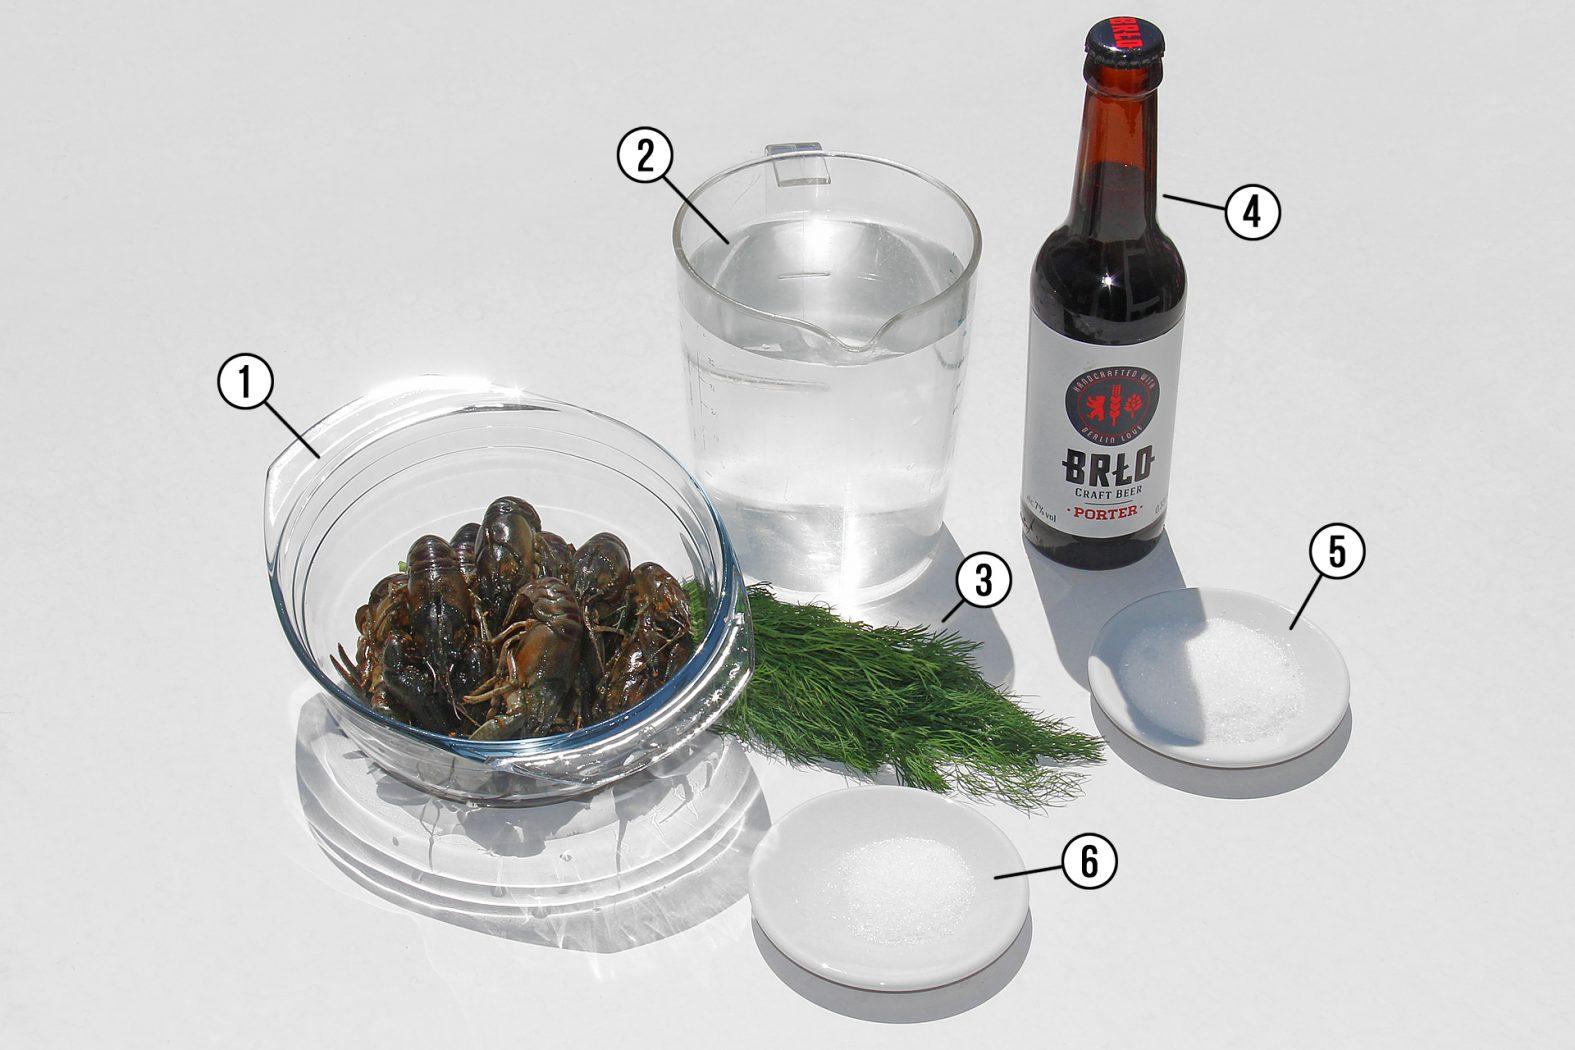 Flusskrebs-Rezept aus Schweden